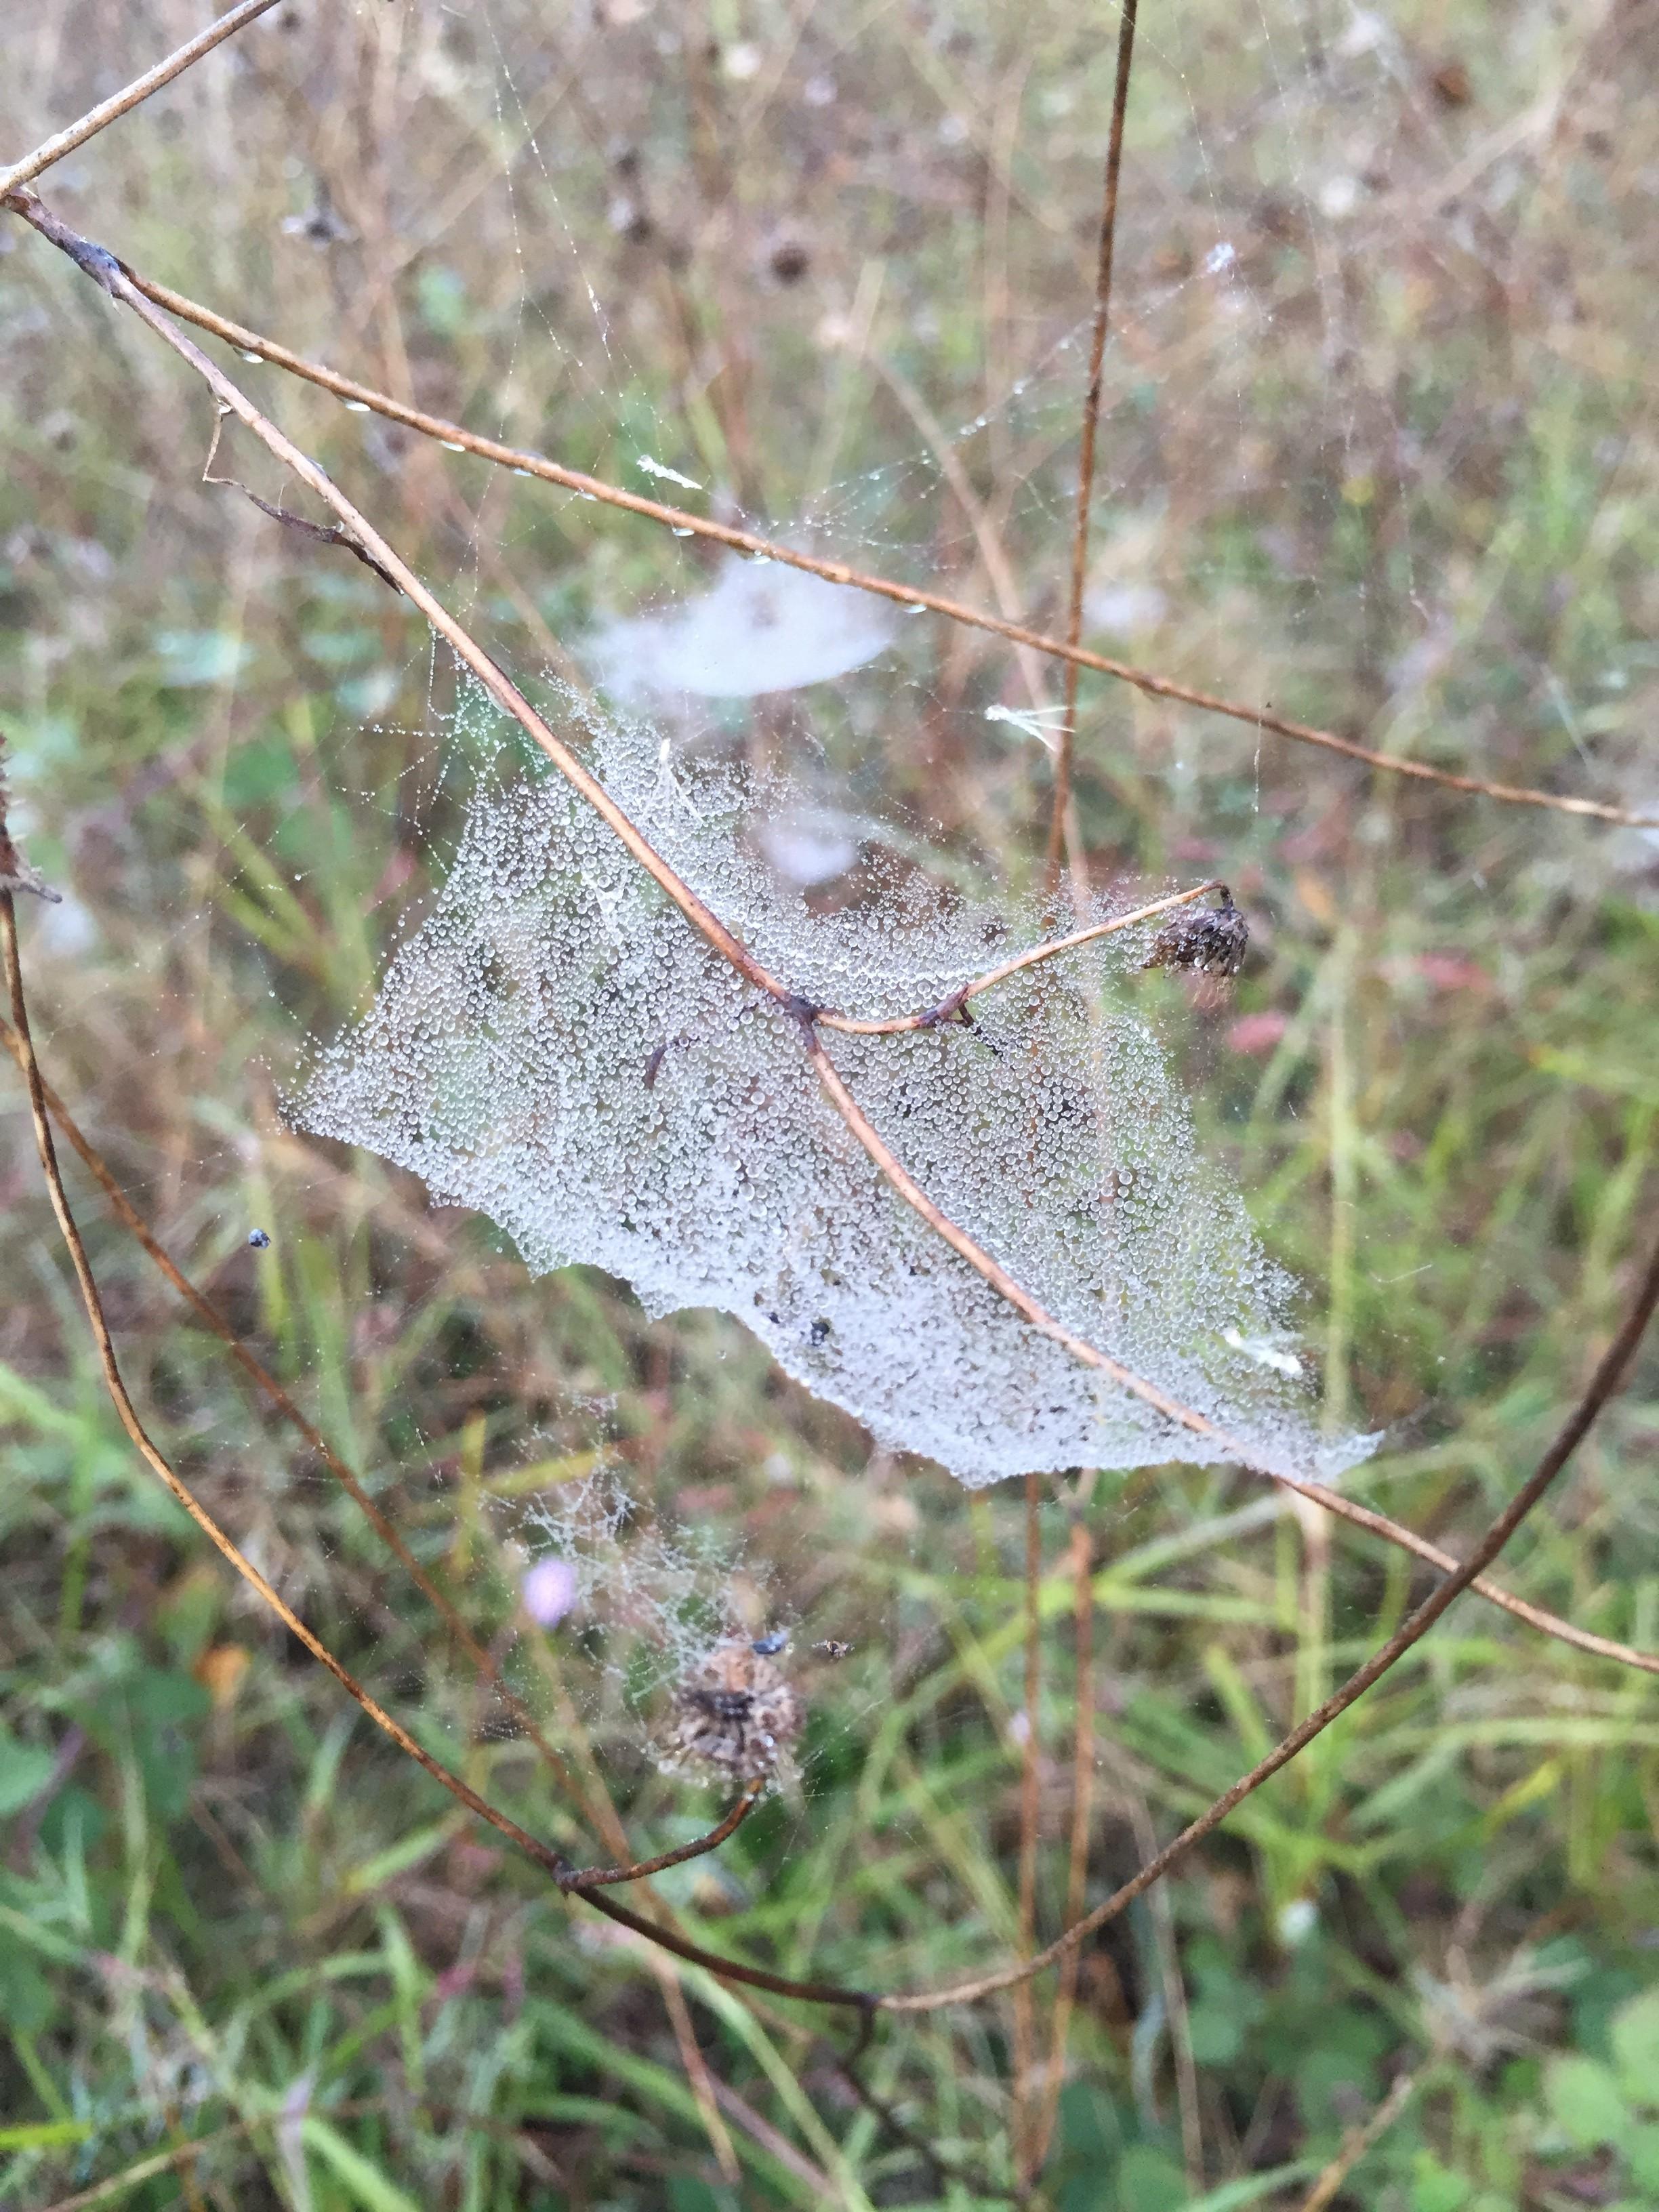 Misty morning cobwebs